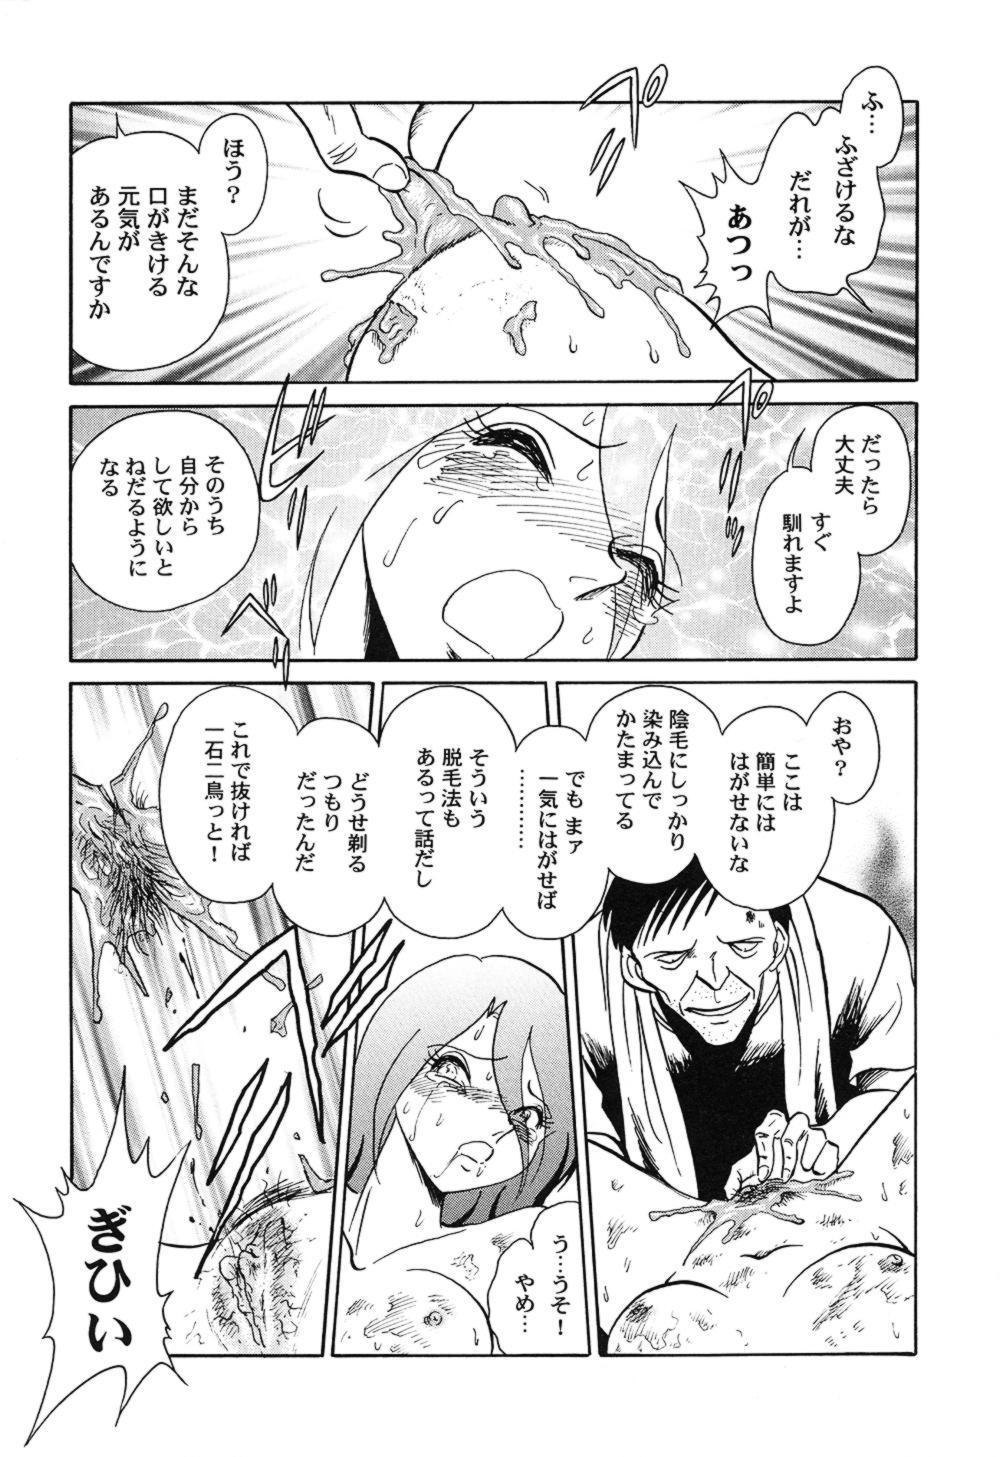 Hageshii Kagai Jugyou 57